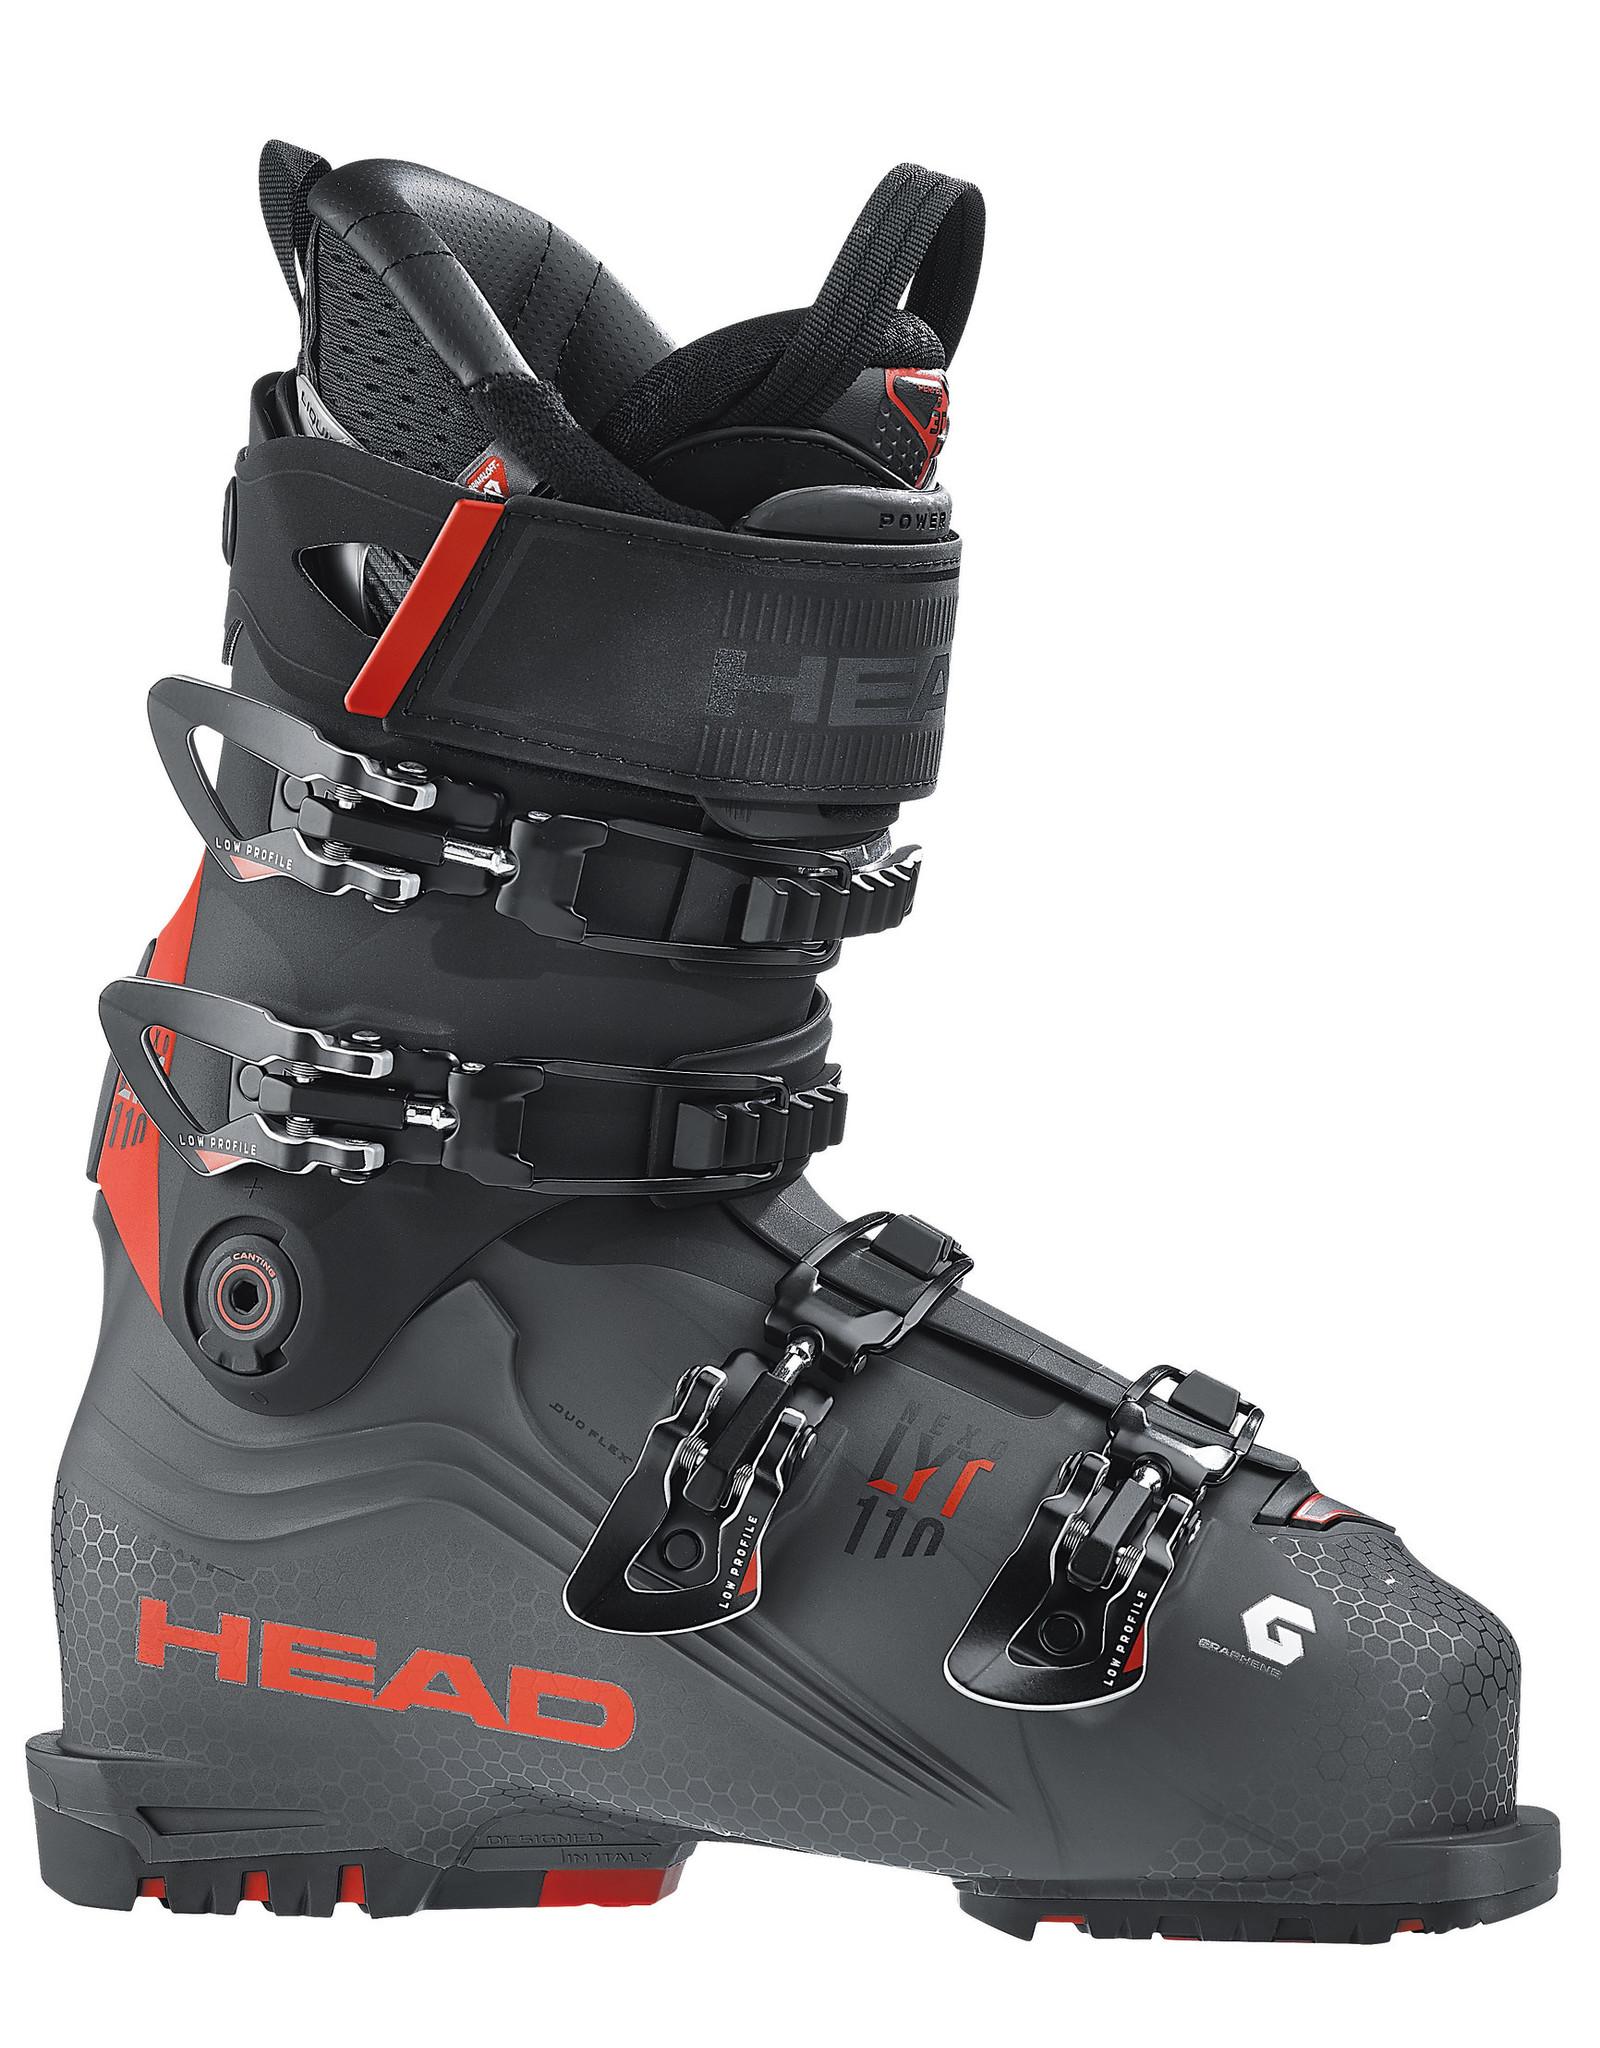 HEAD HEAD NEXO LYT 110 ANTHRACITE /RED BOTTE SKI ALPIN